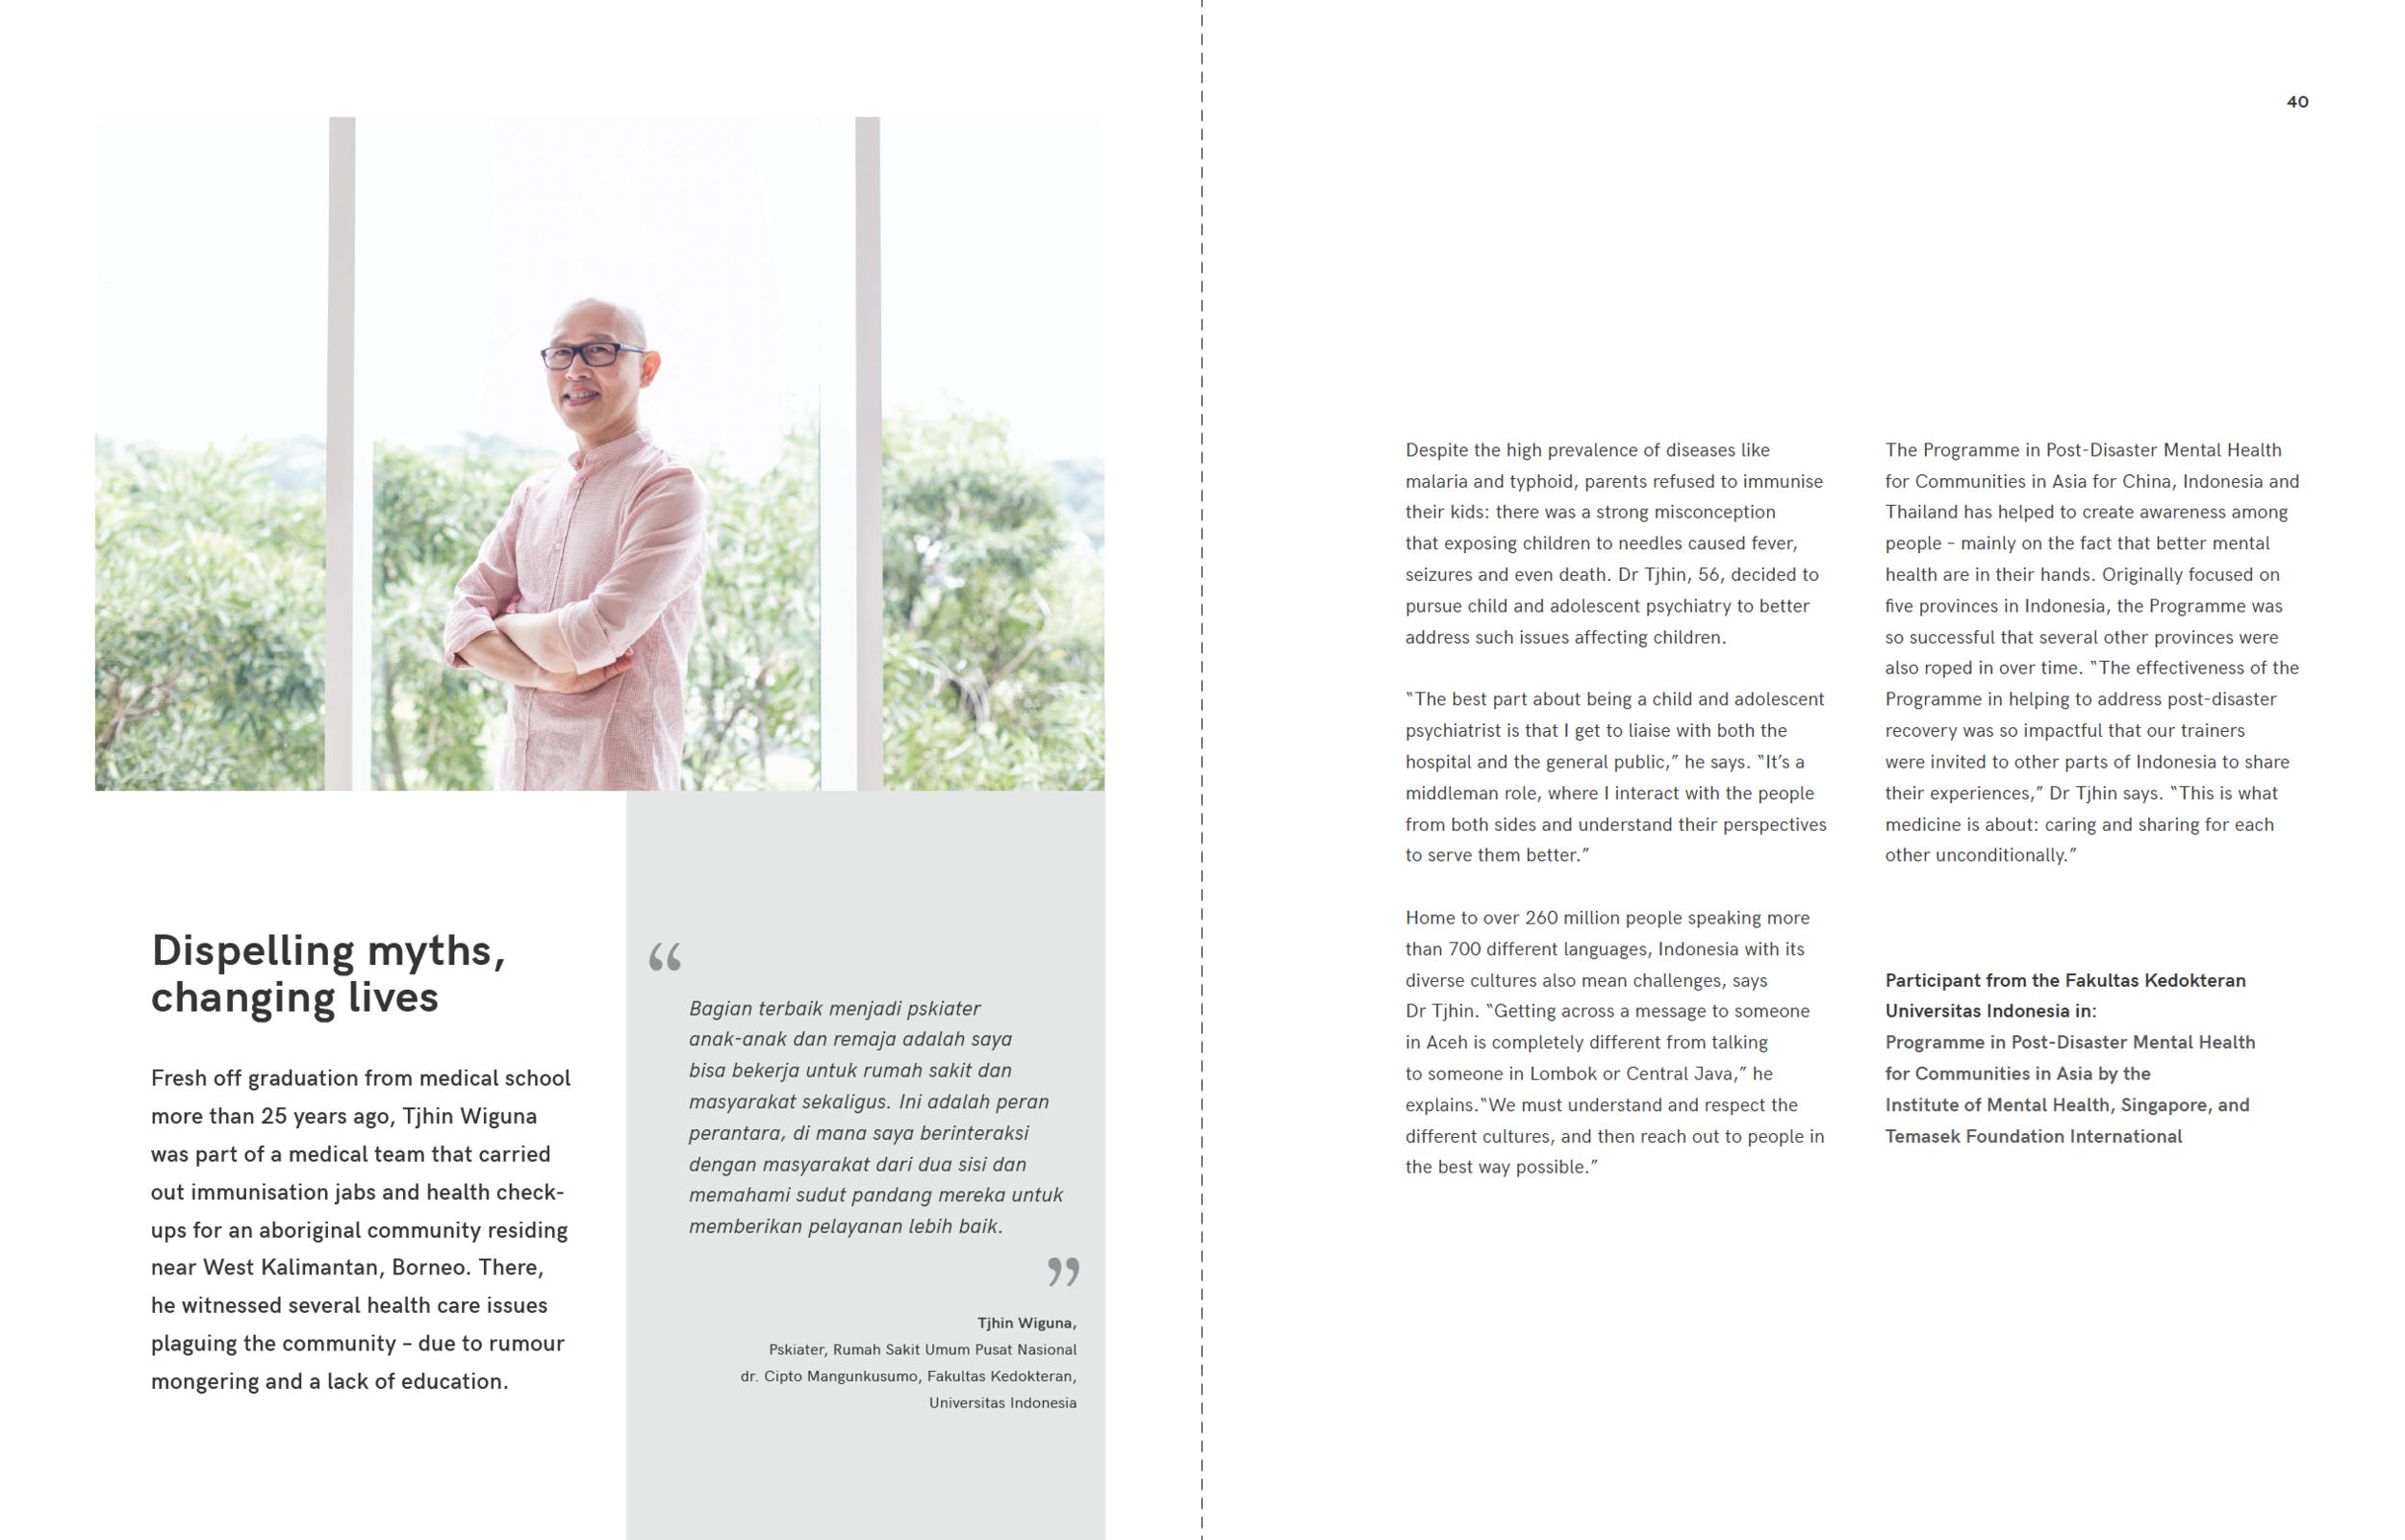 singapore-photographer-zainal-zainal-studio-temasek-foundation-international-06.png